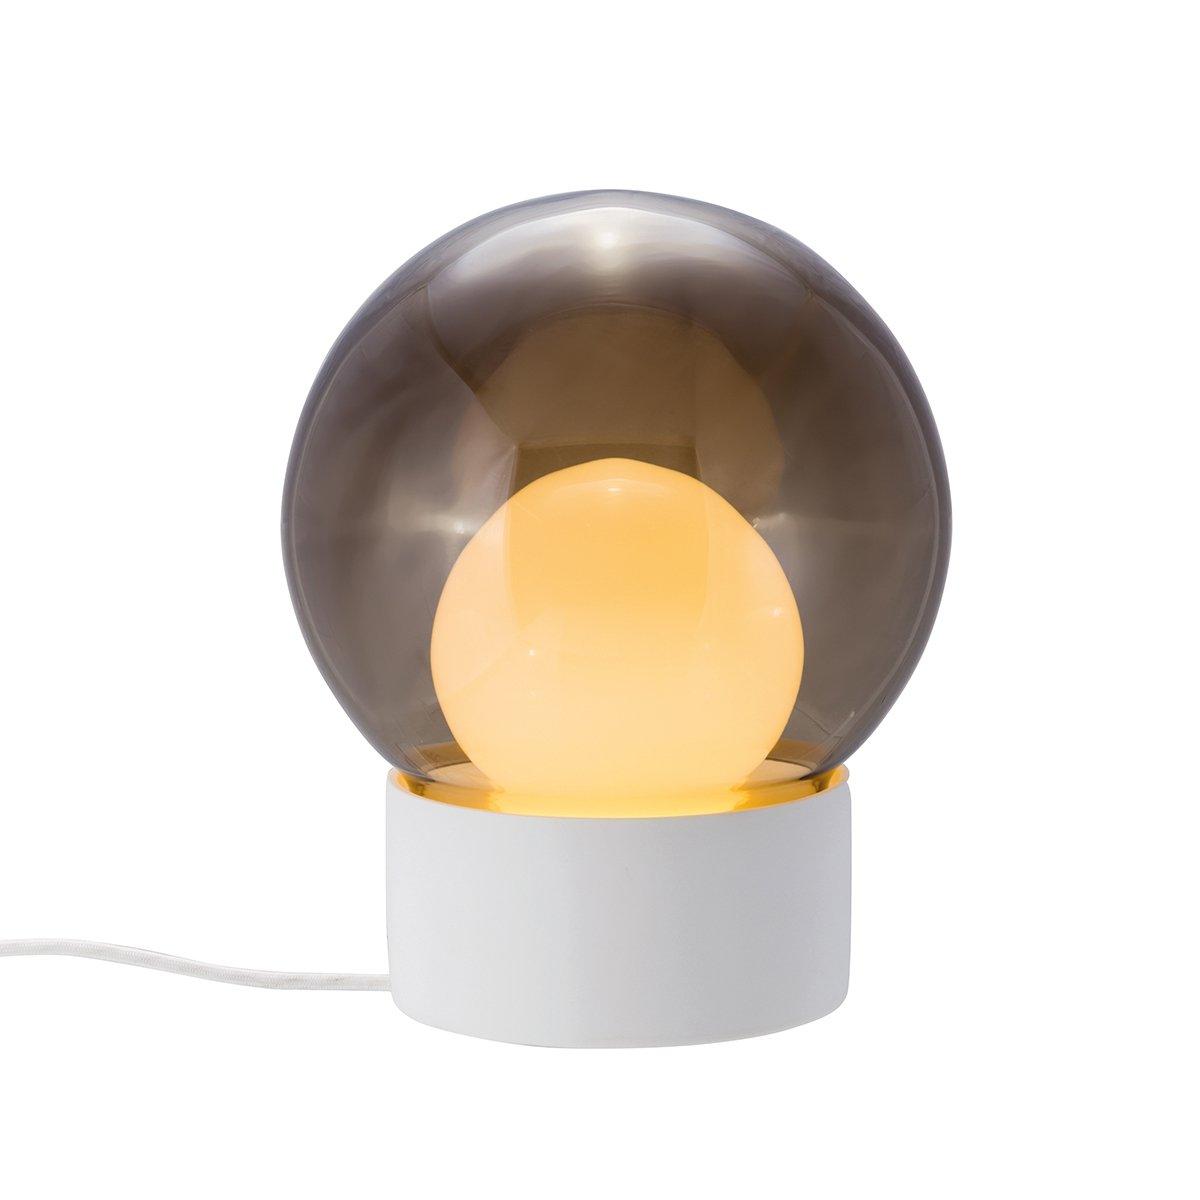 Pulpo Boule Tafellamp Sebastian Herkner - Wit - Smoke Grey - Opaal Wit